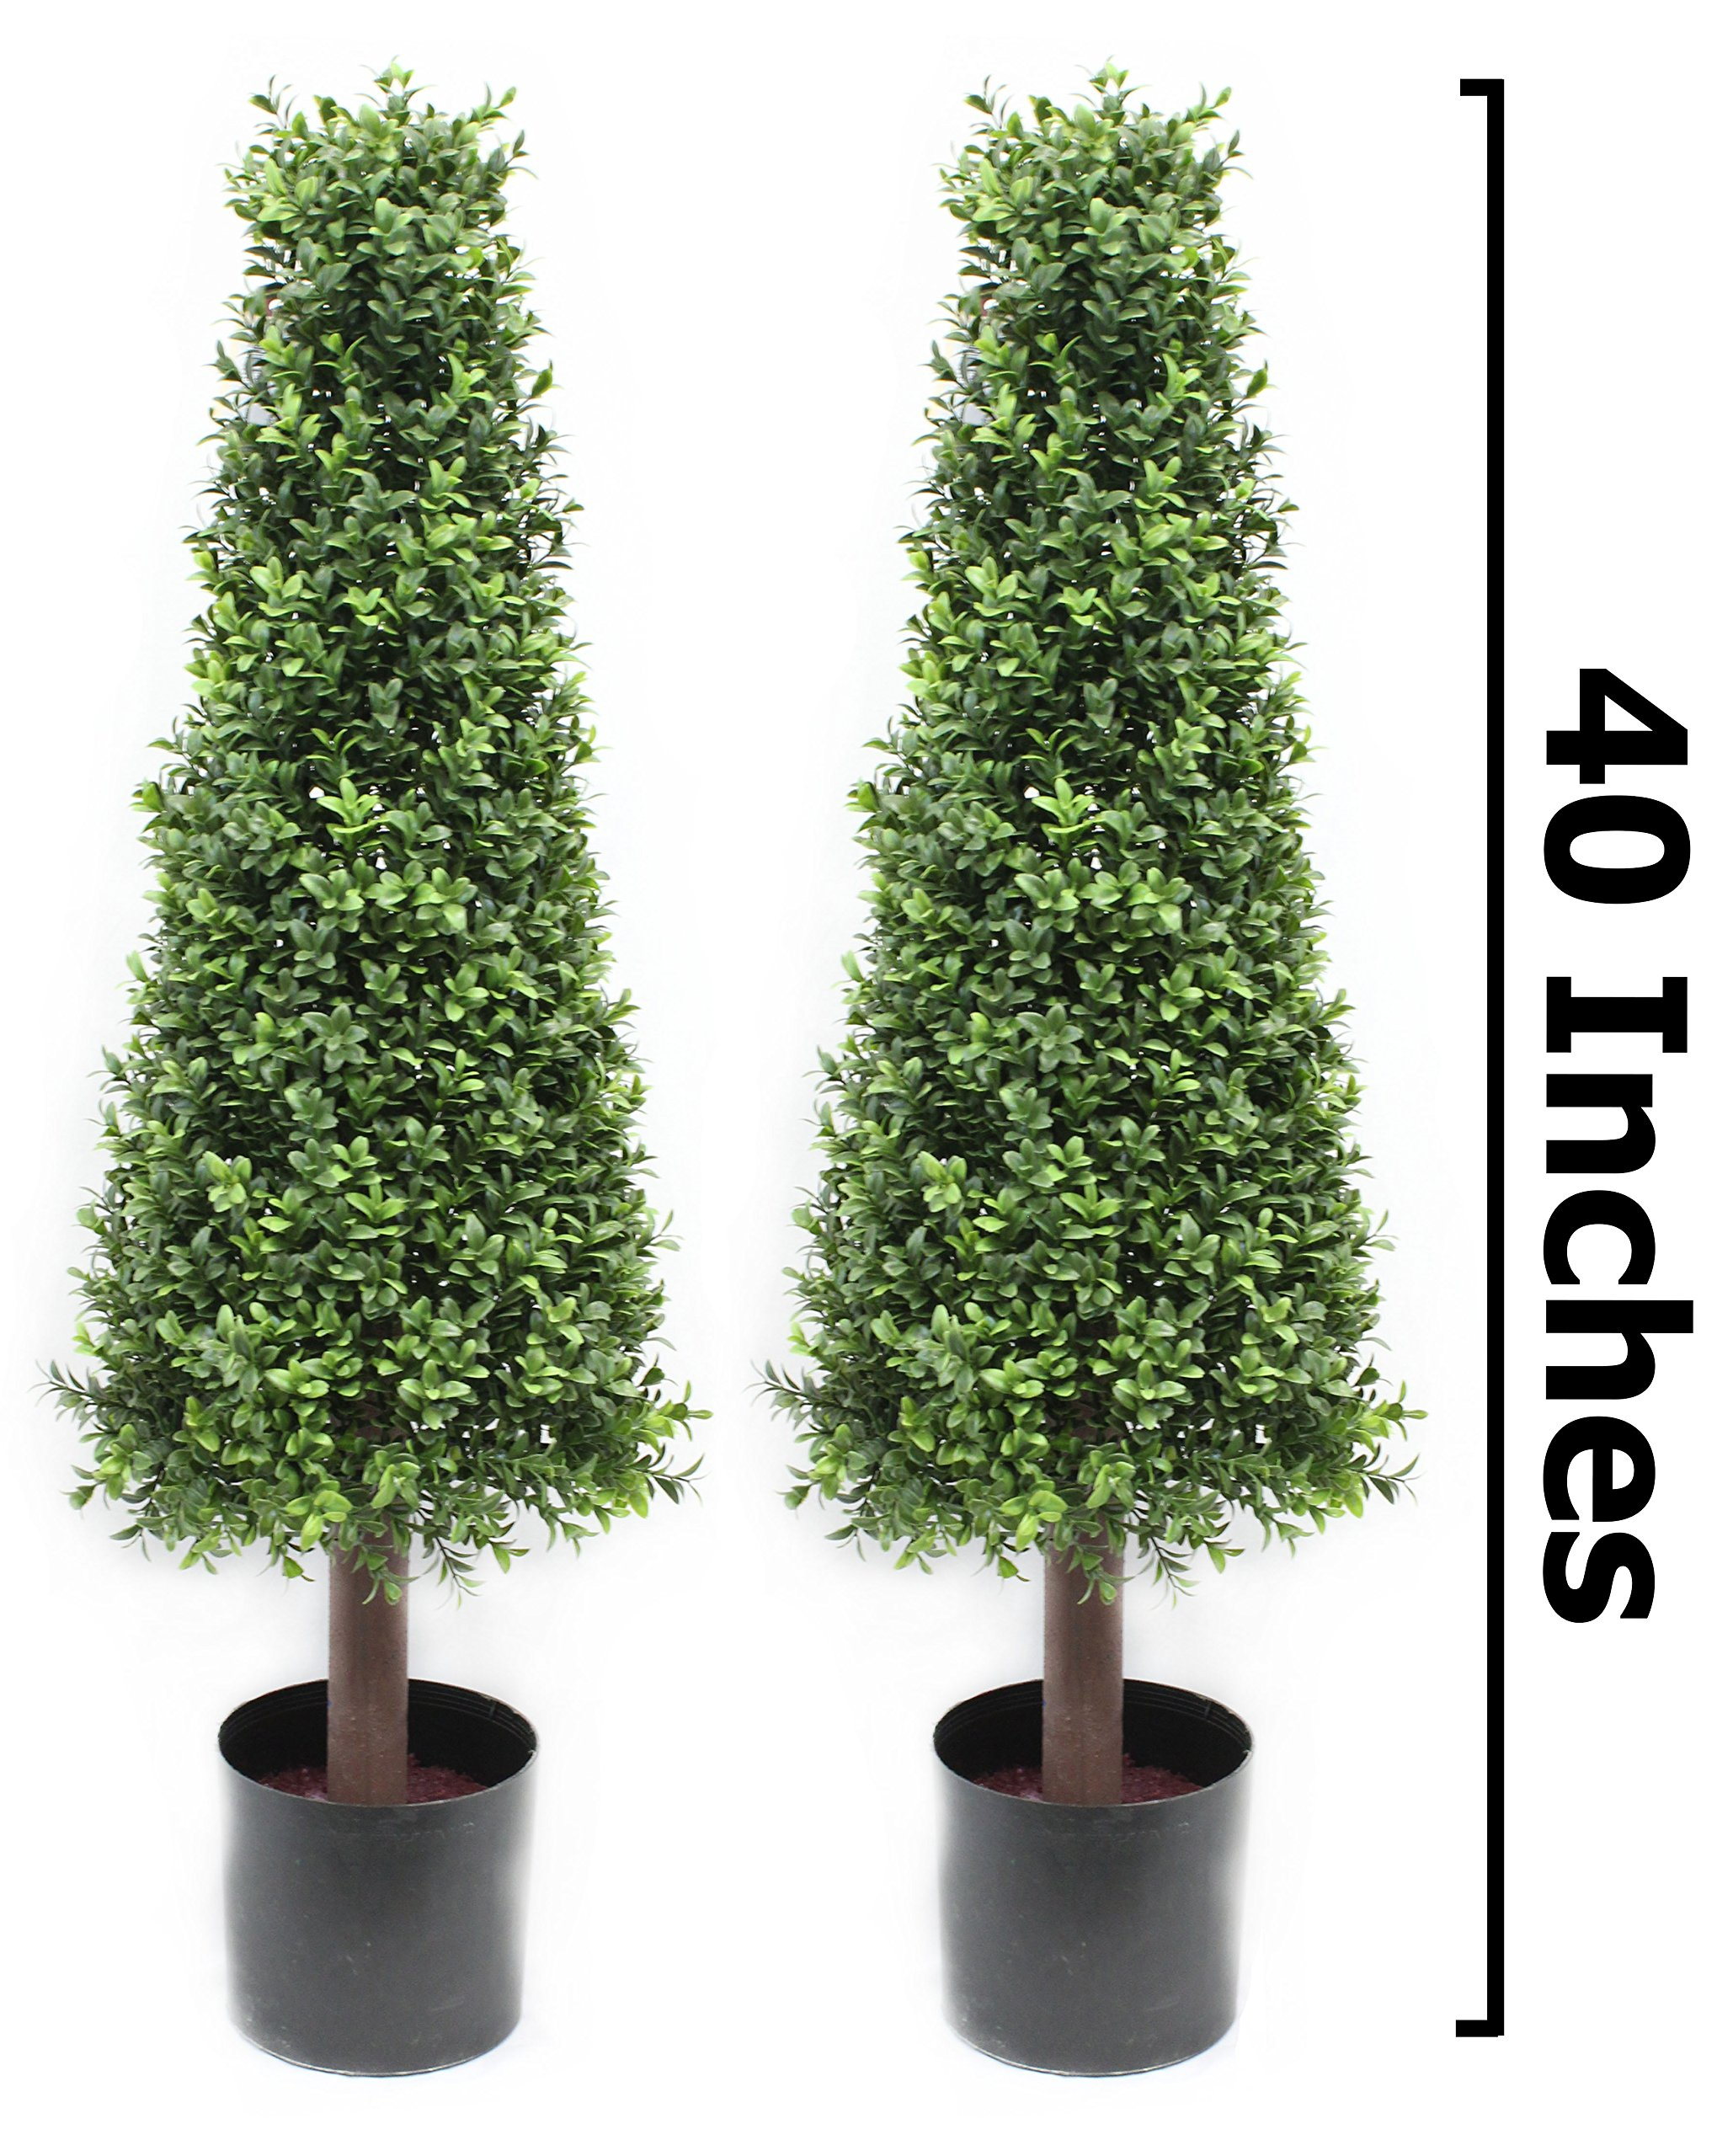 40 Inch Pond Boxwood Cone Topiary Tree Premium Realistic Faux Artificial Plant Home Decor or Office Fake Tree by Silk Road Home by Silk Road Home